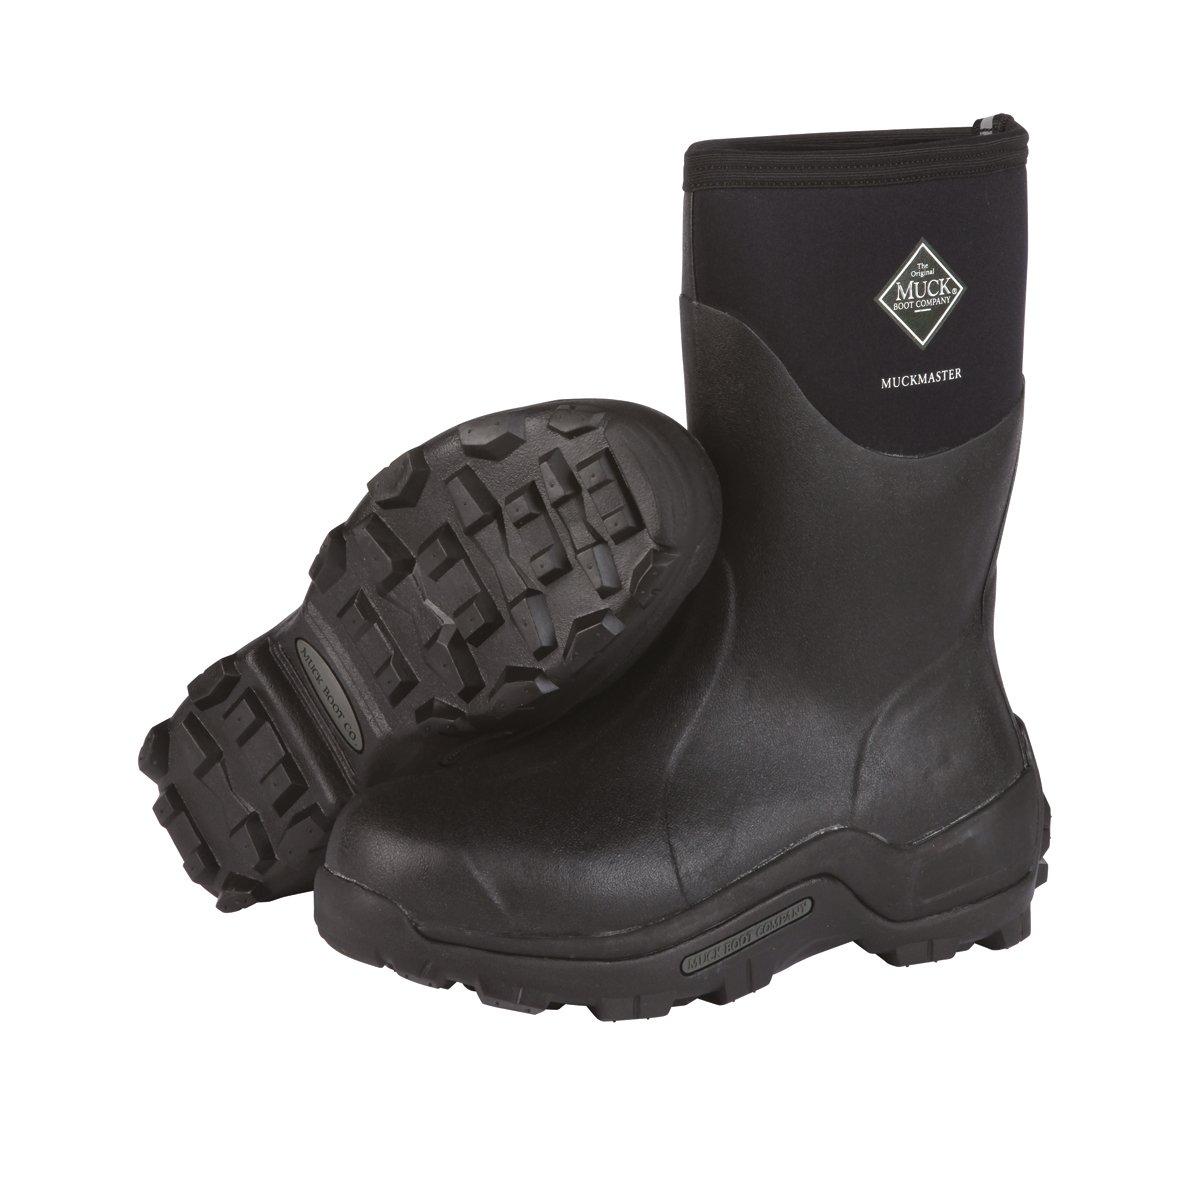 The Original MuckBoots MuckMaster Mid Boot B000YYEXGY Men's 14 M/Women's 15 M|Black